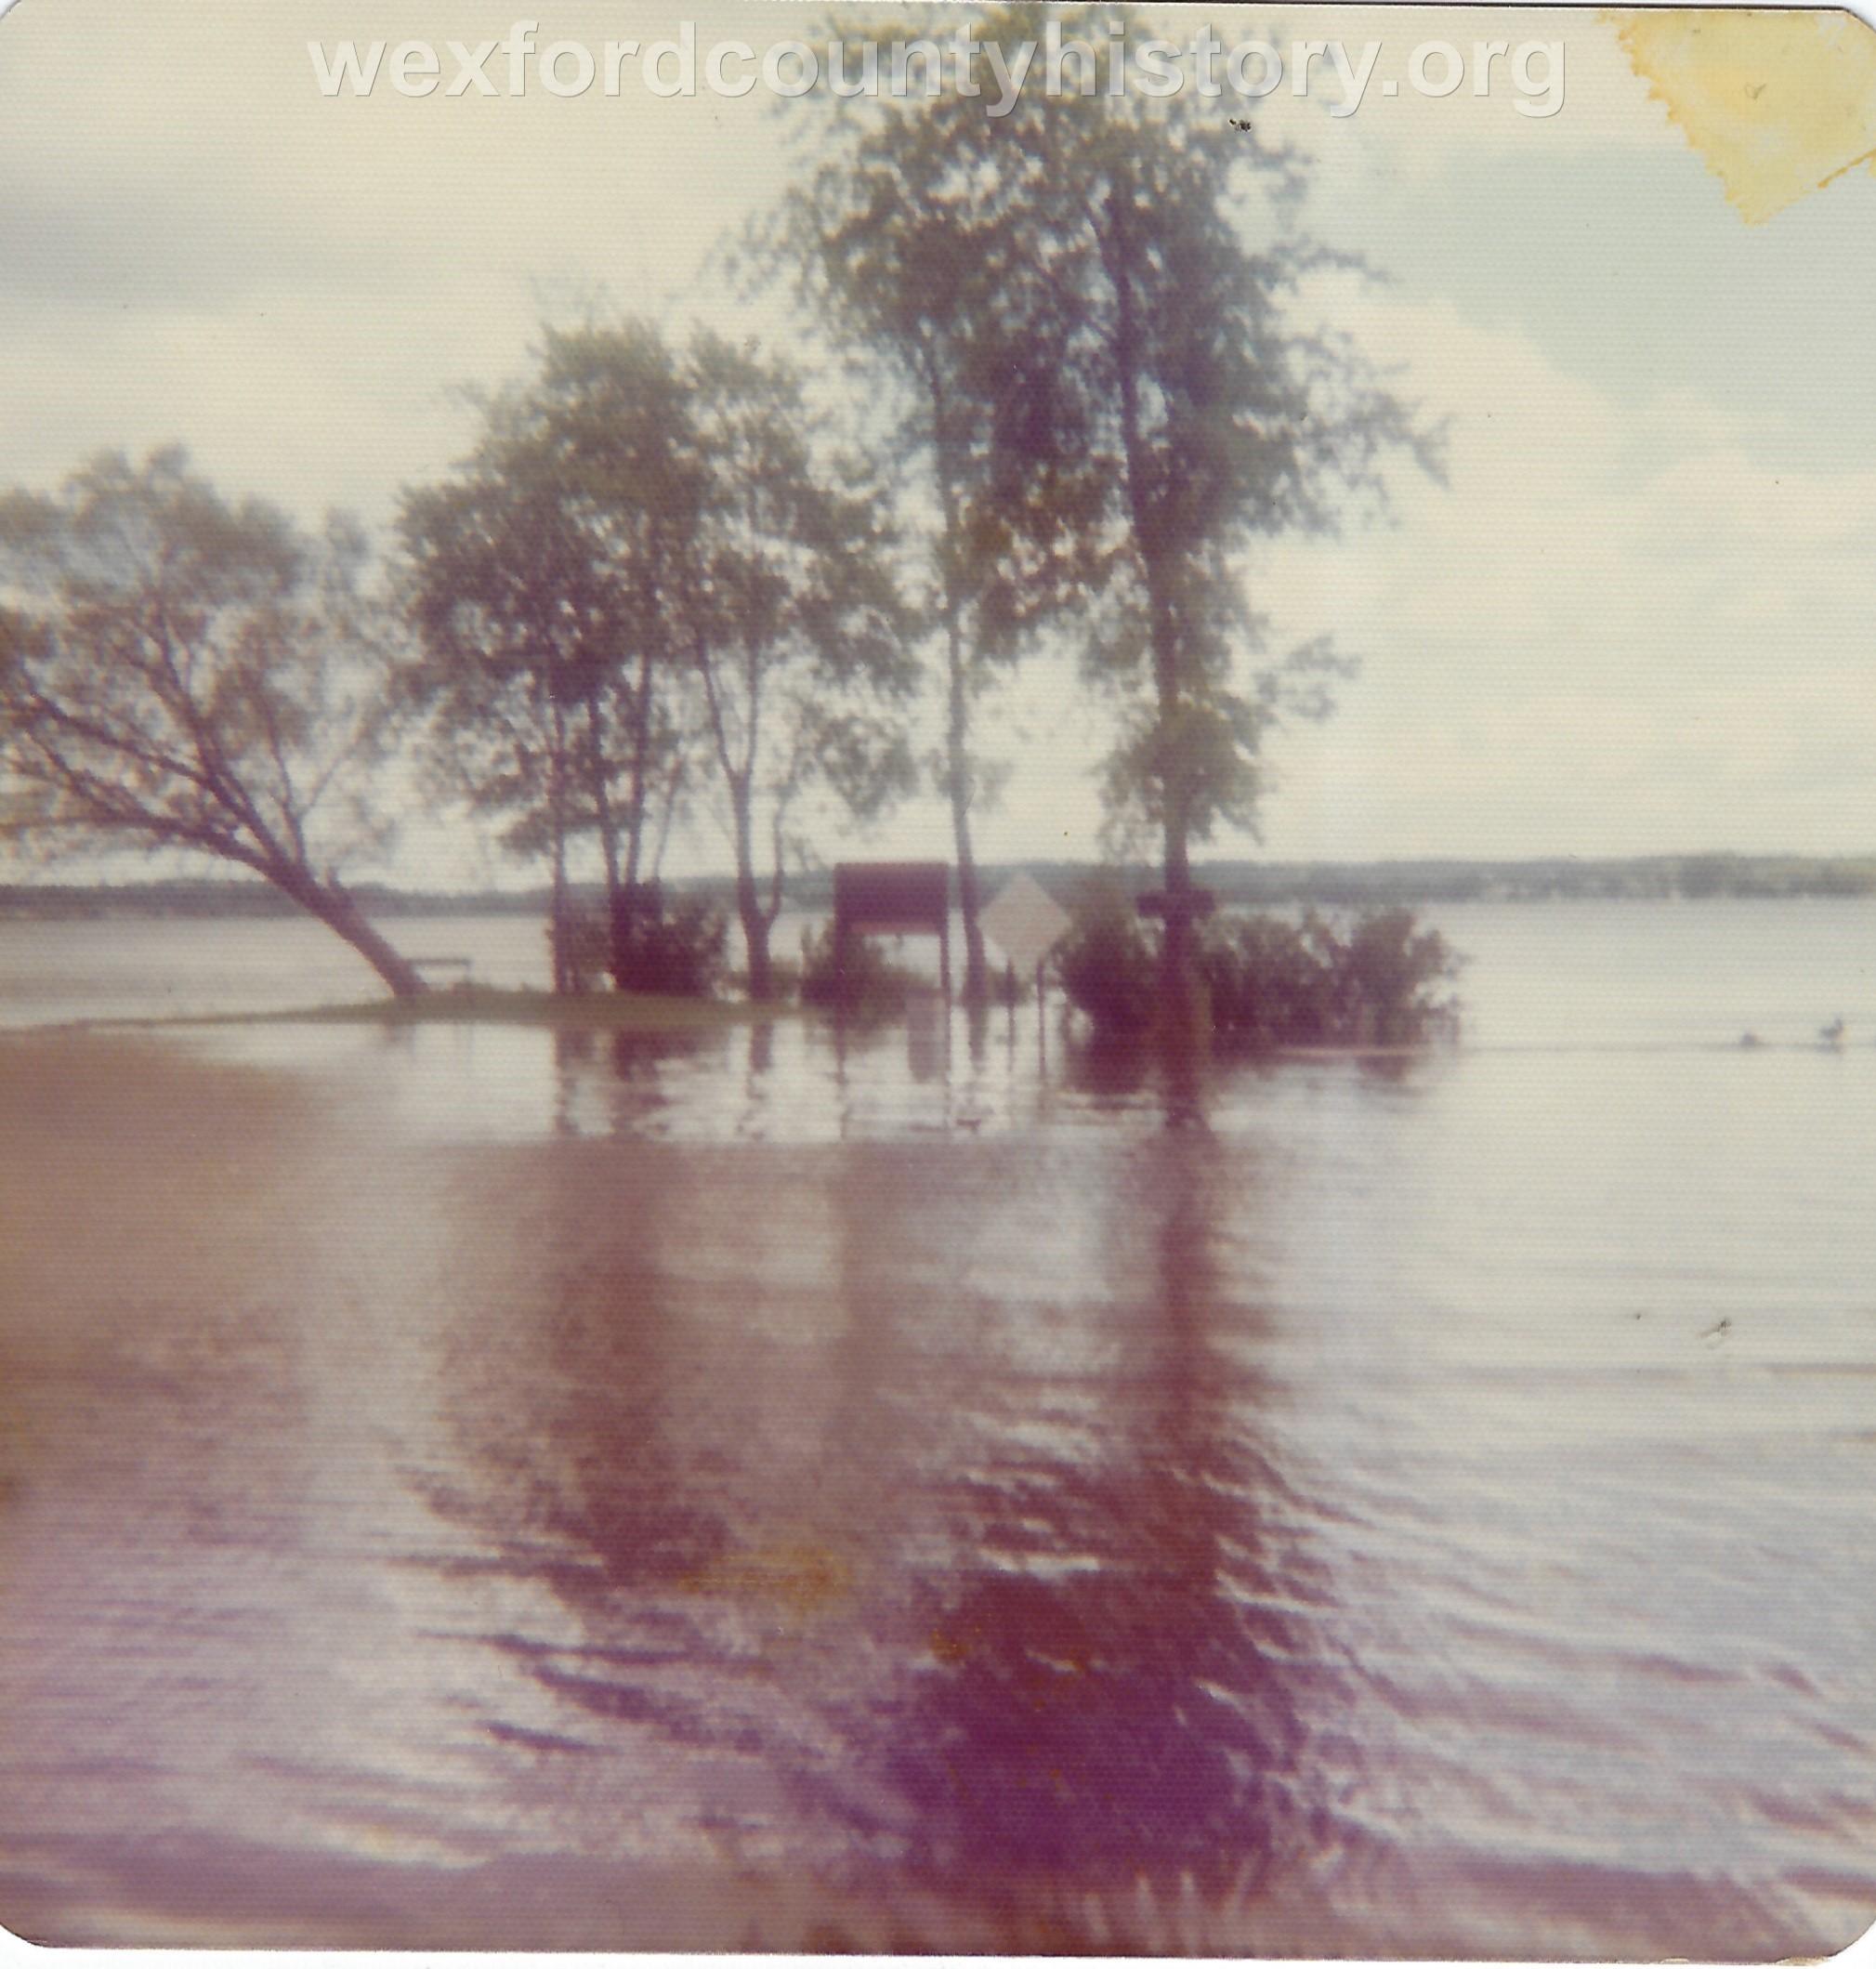 Flooding at Kenwood Park